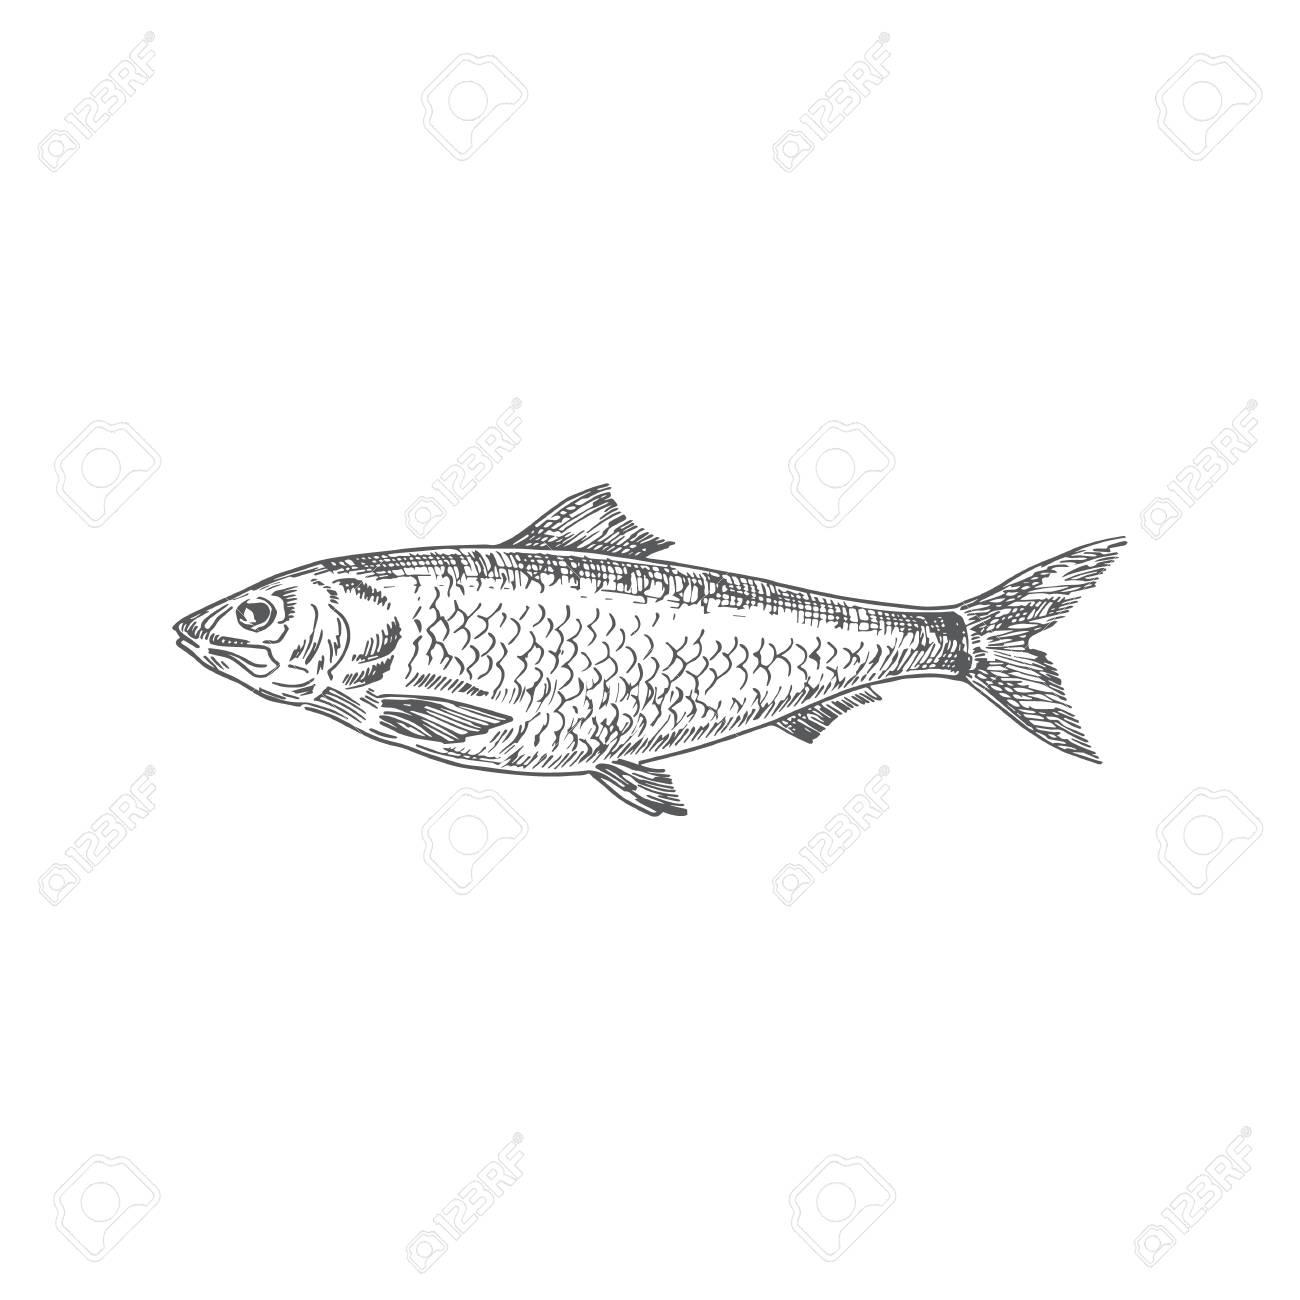 Herring Hand Drawn Vector Illustration Abstract Fish Sketch